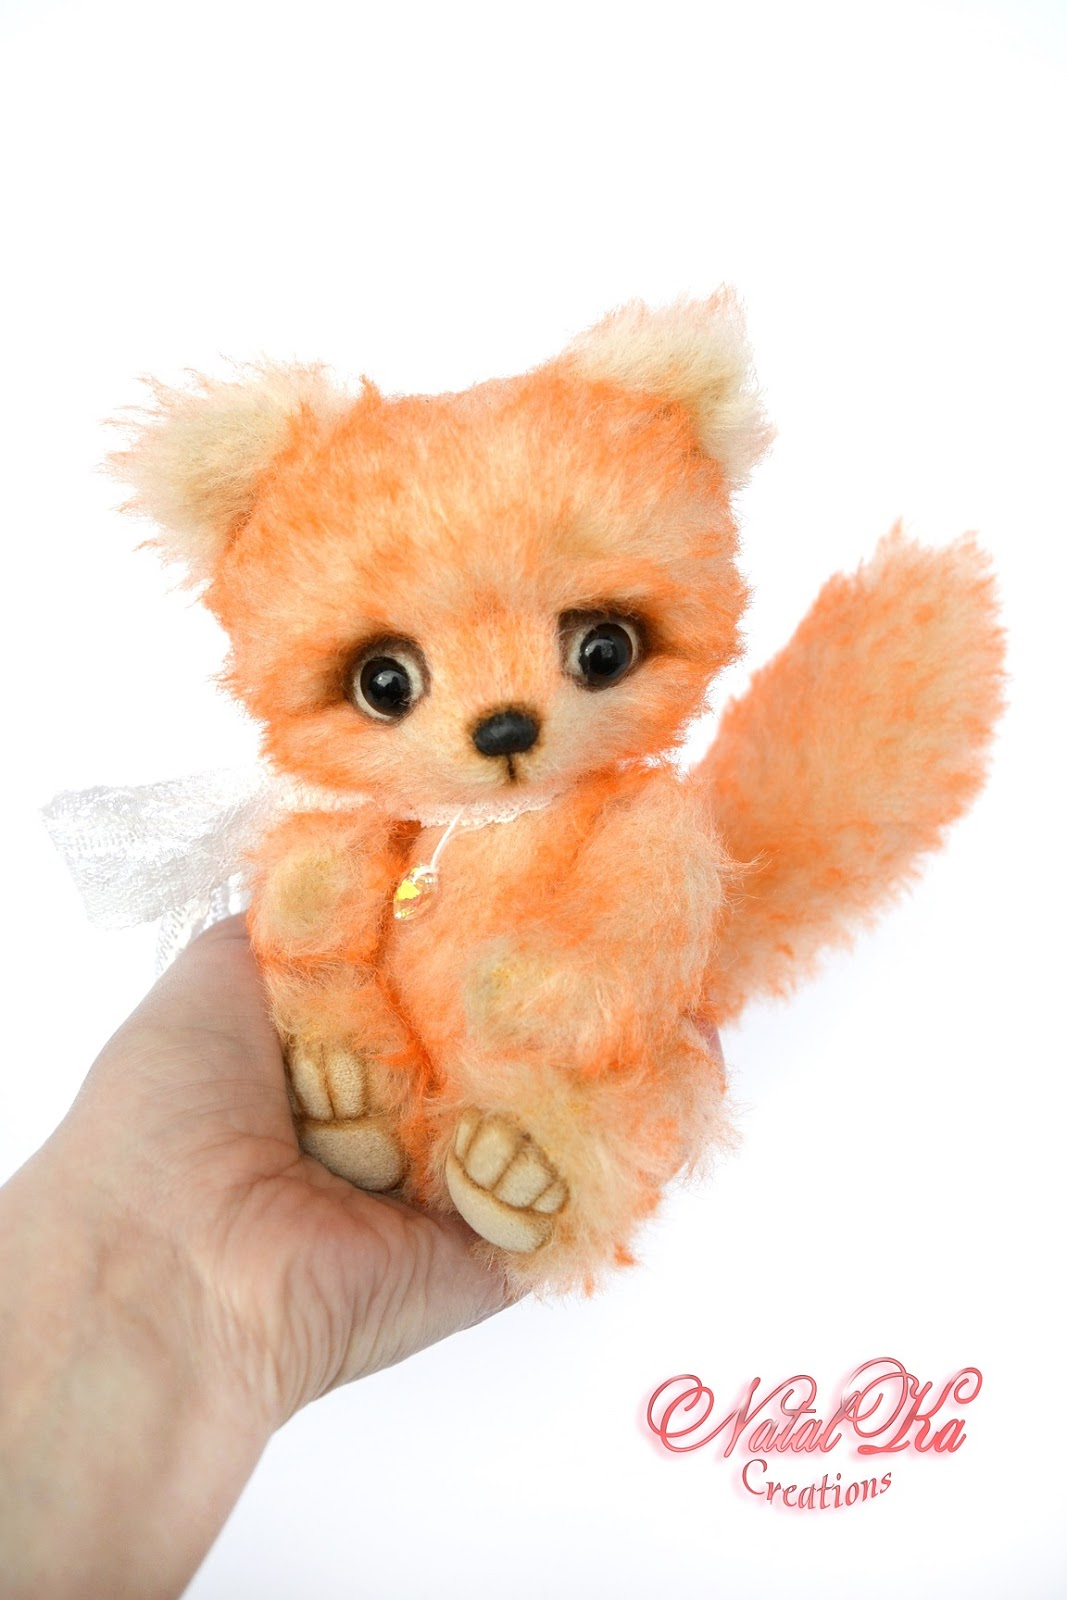 Авторский лисенок тедди, лиса тедди, artist teddy fox, jointed fox, handmade fox, ooak, teddy fox, Künstler Fuchs, Künstlerteddy, Unikat, handgemacht von NatalKa Creations